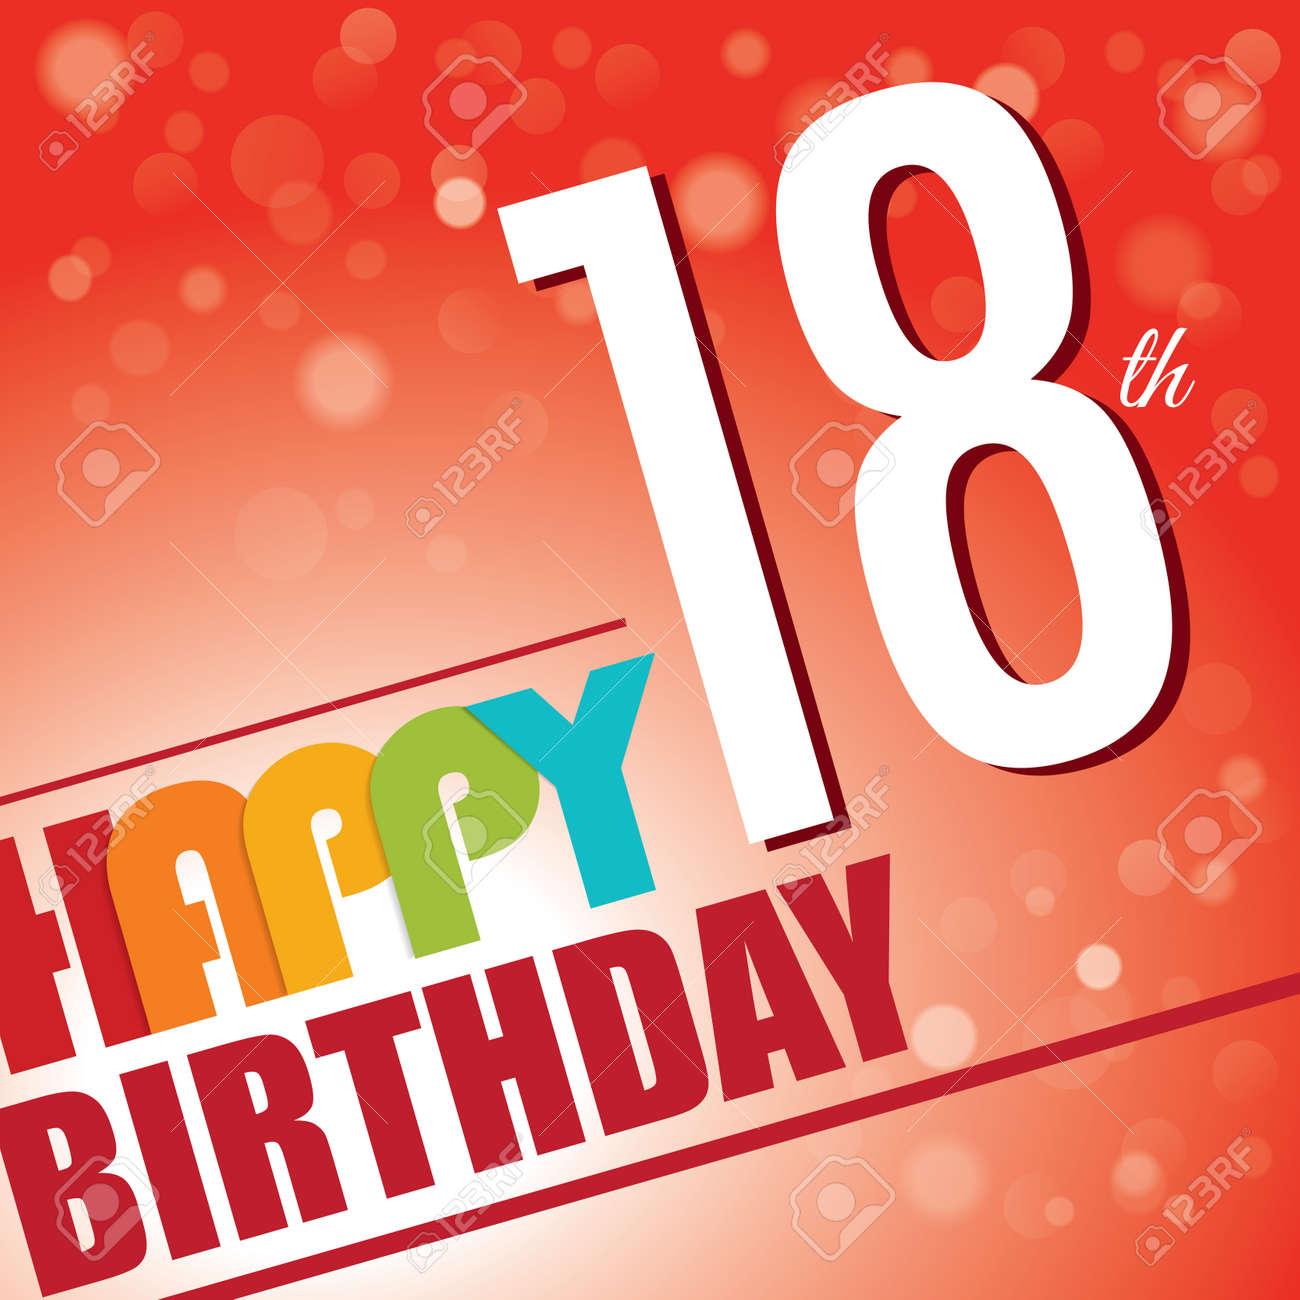 18th Birthday Party Invite Template Design In Bright And Colourful Retro Style Stock Vector